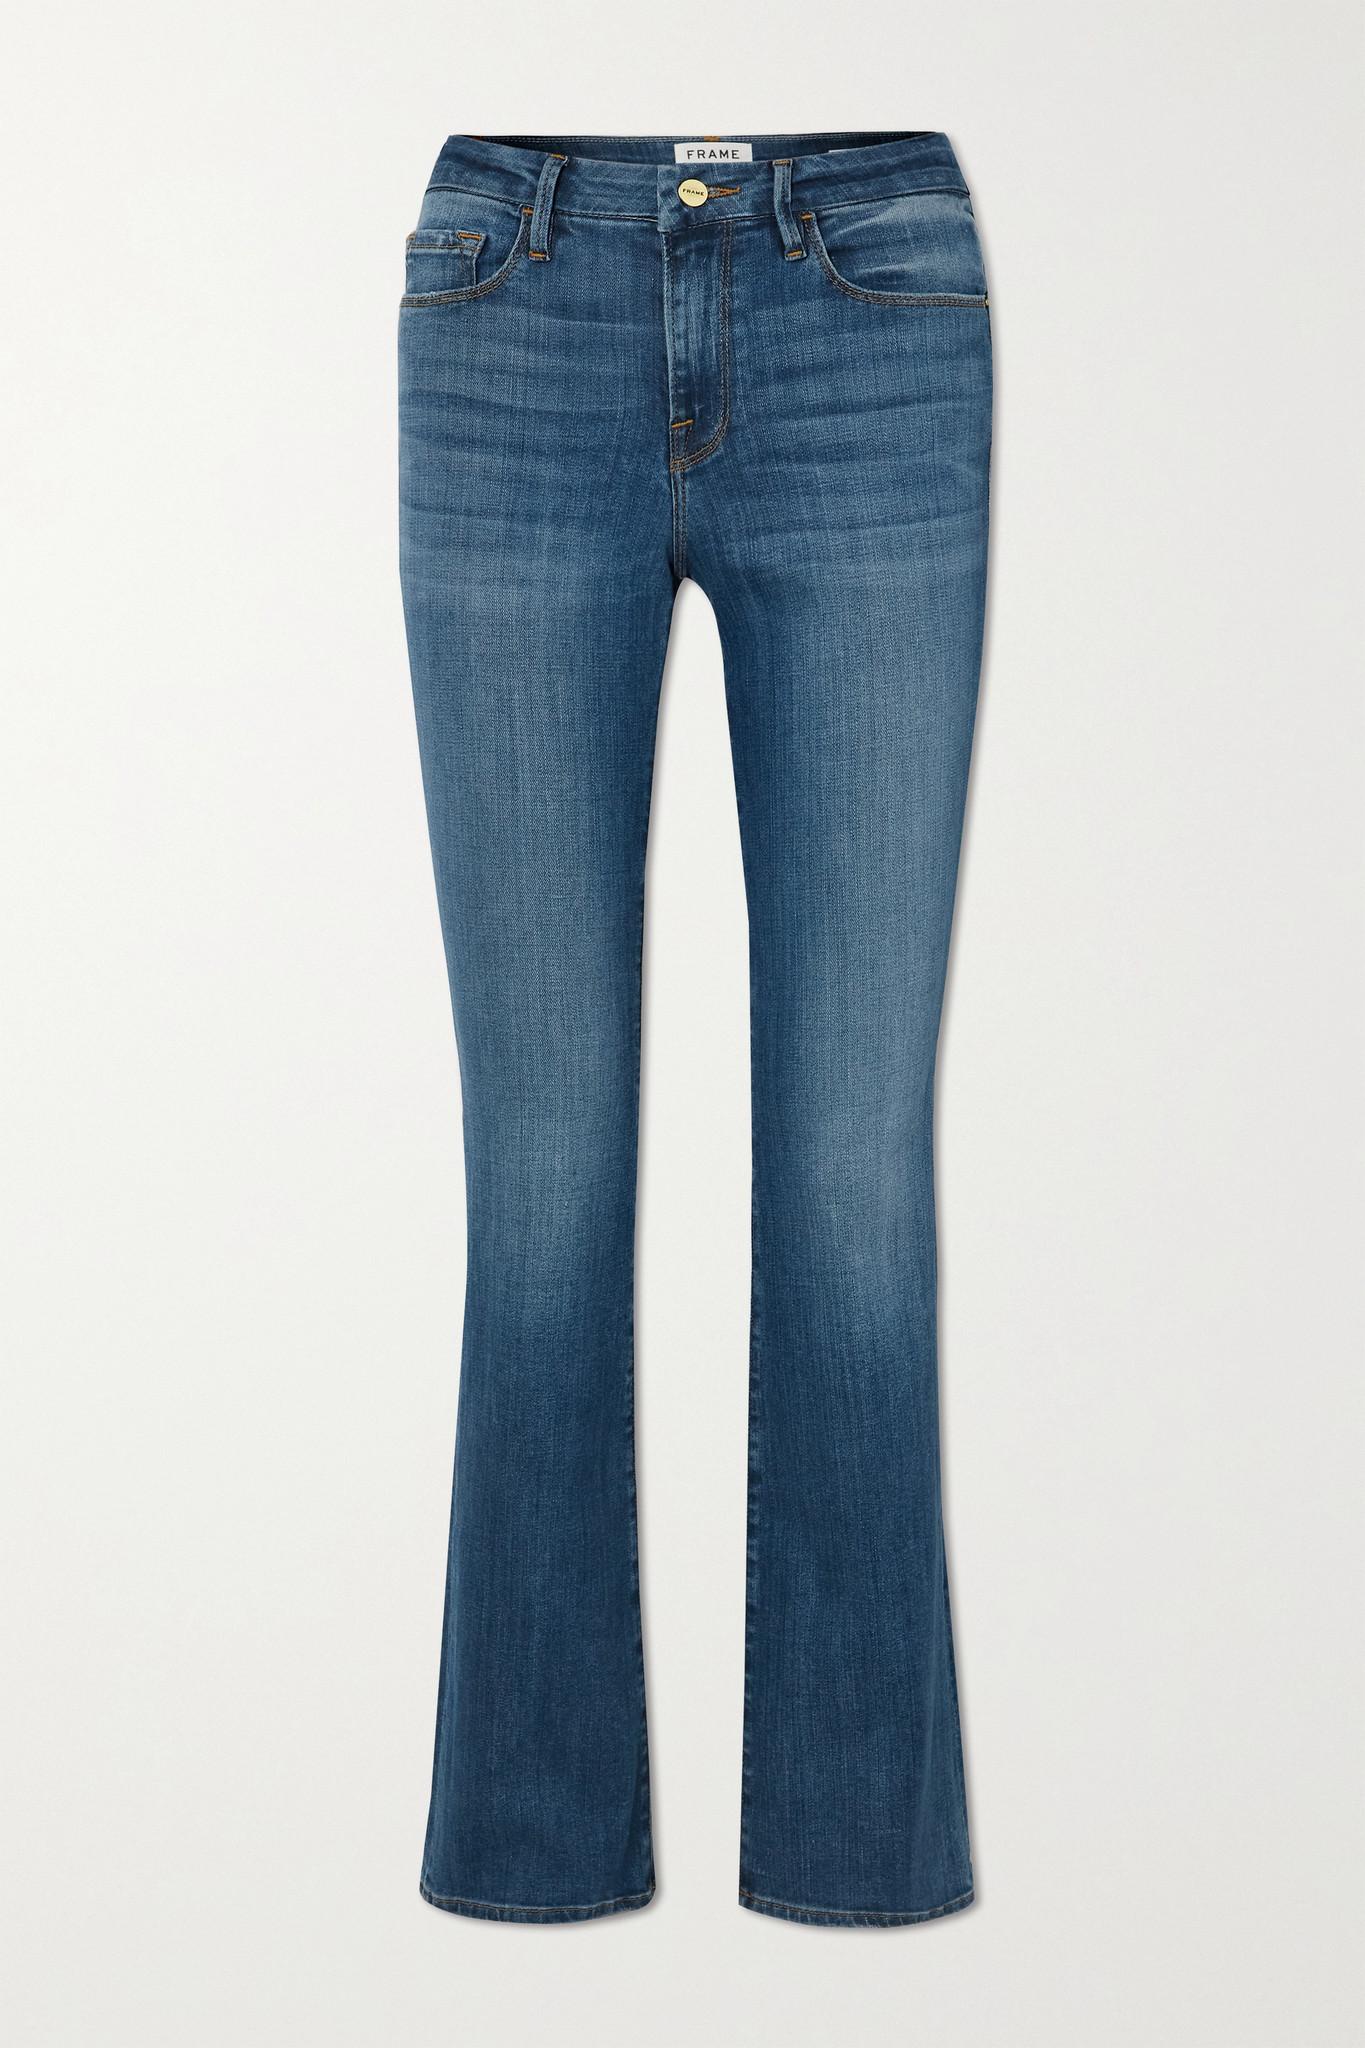 FRAME - Le Mini Boot Mid-rise Jeans - Blue - 30